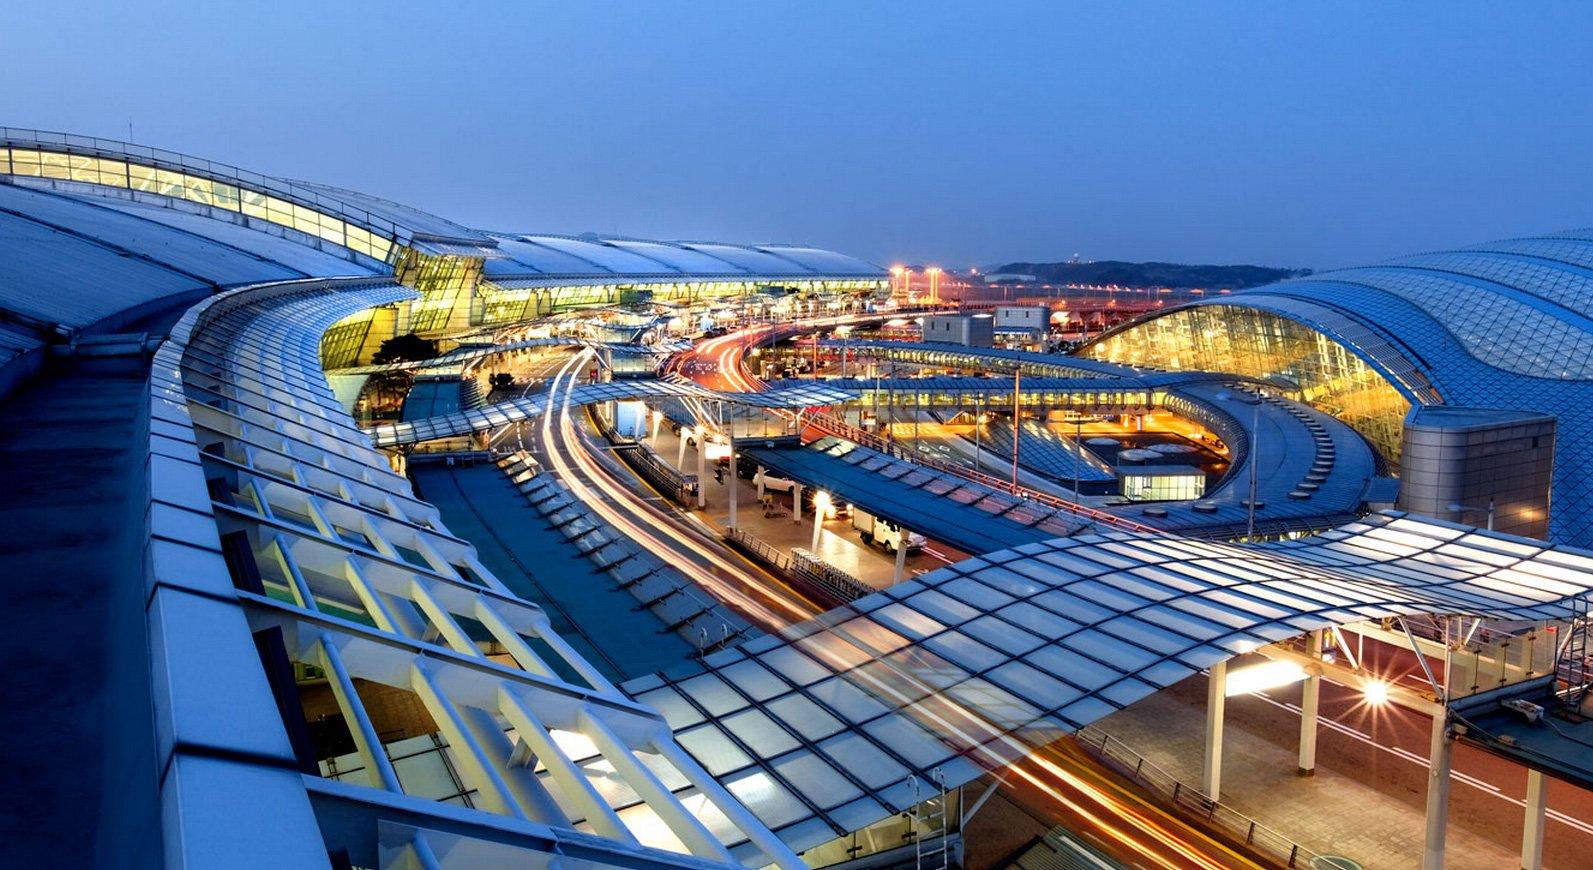 مطار انشون الدولي كوريا